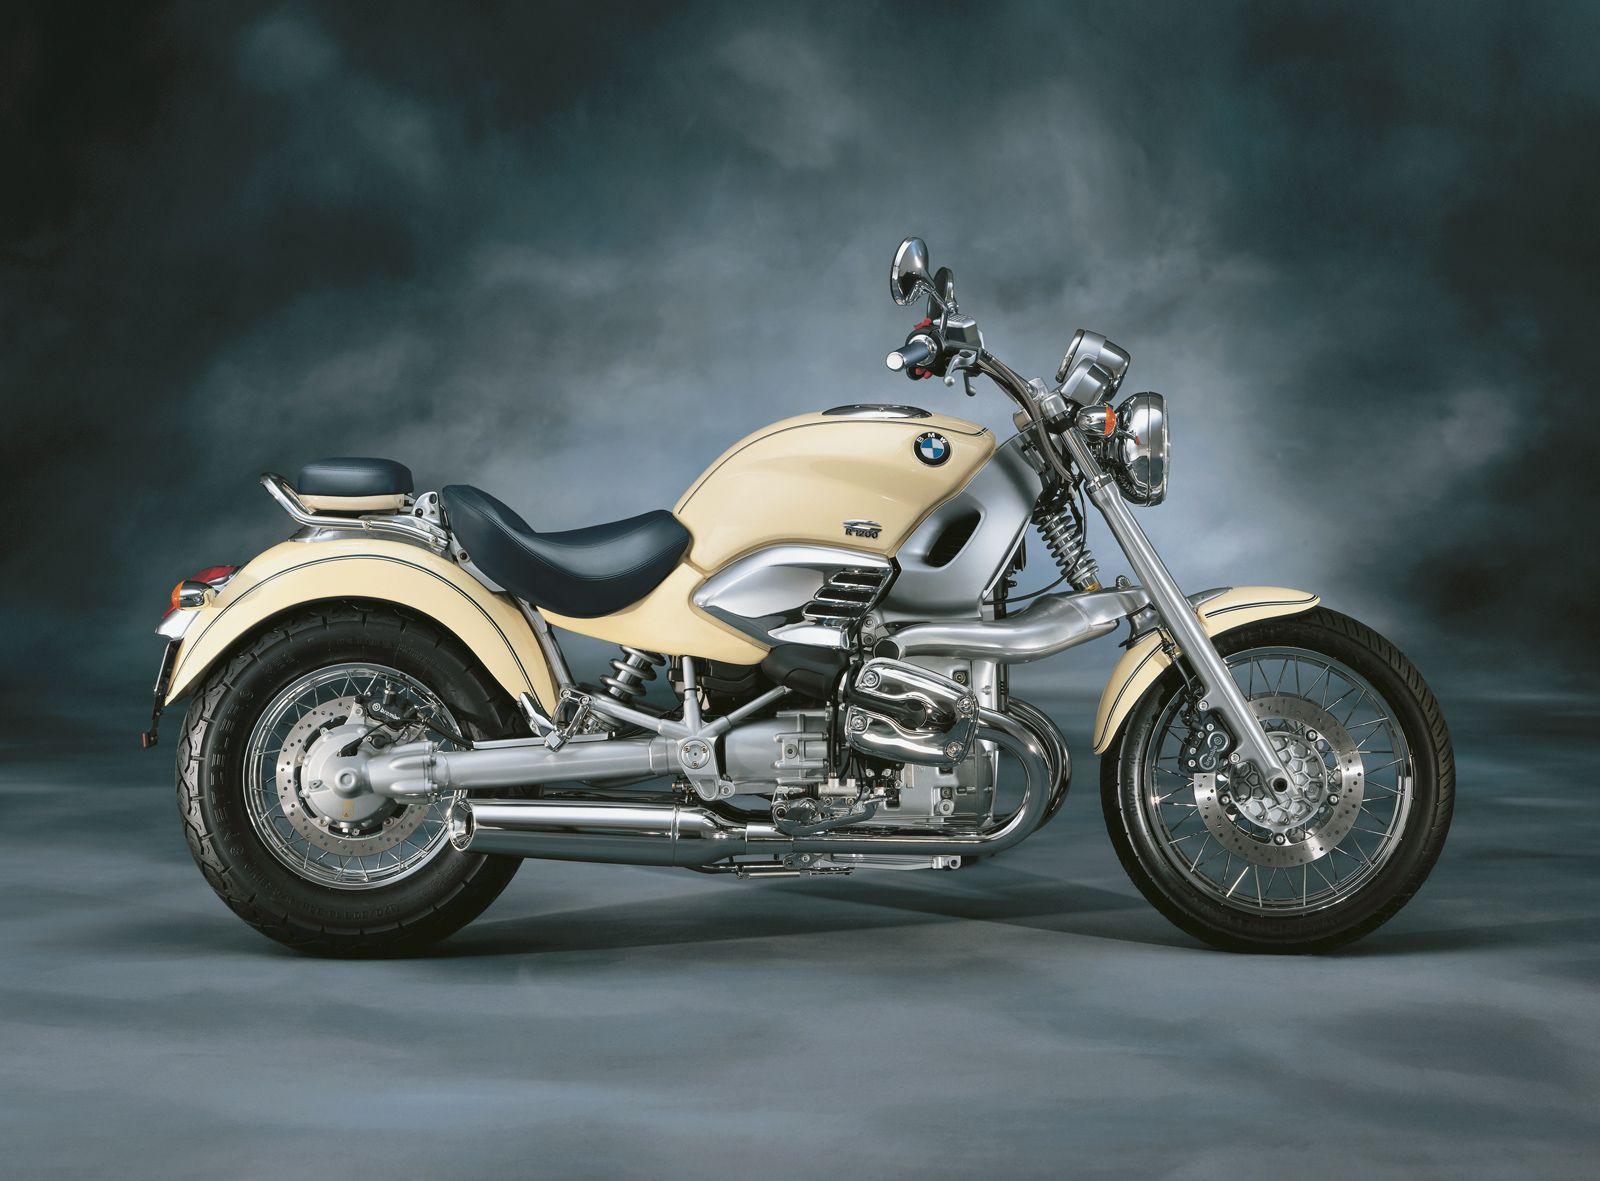 BMW R1200C cruiser - My ultimate open road bike